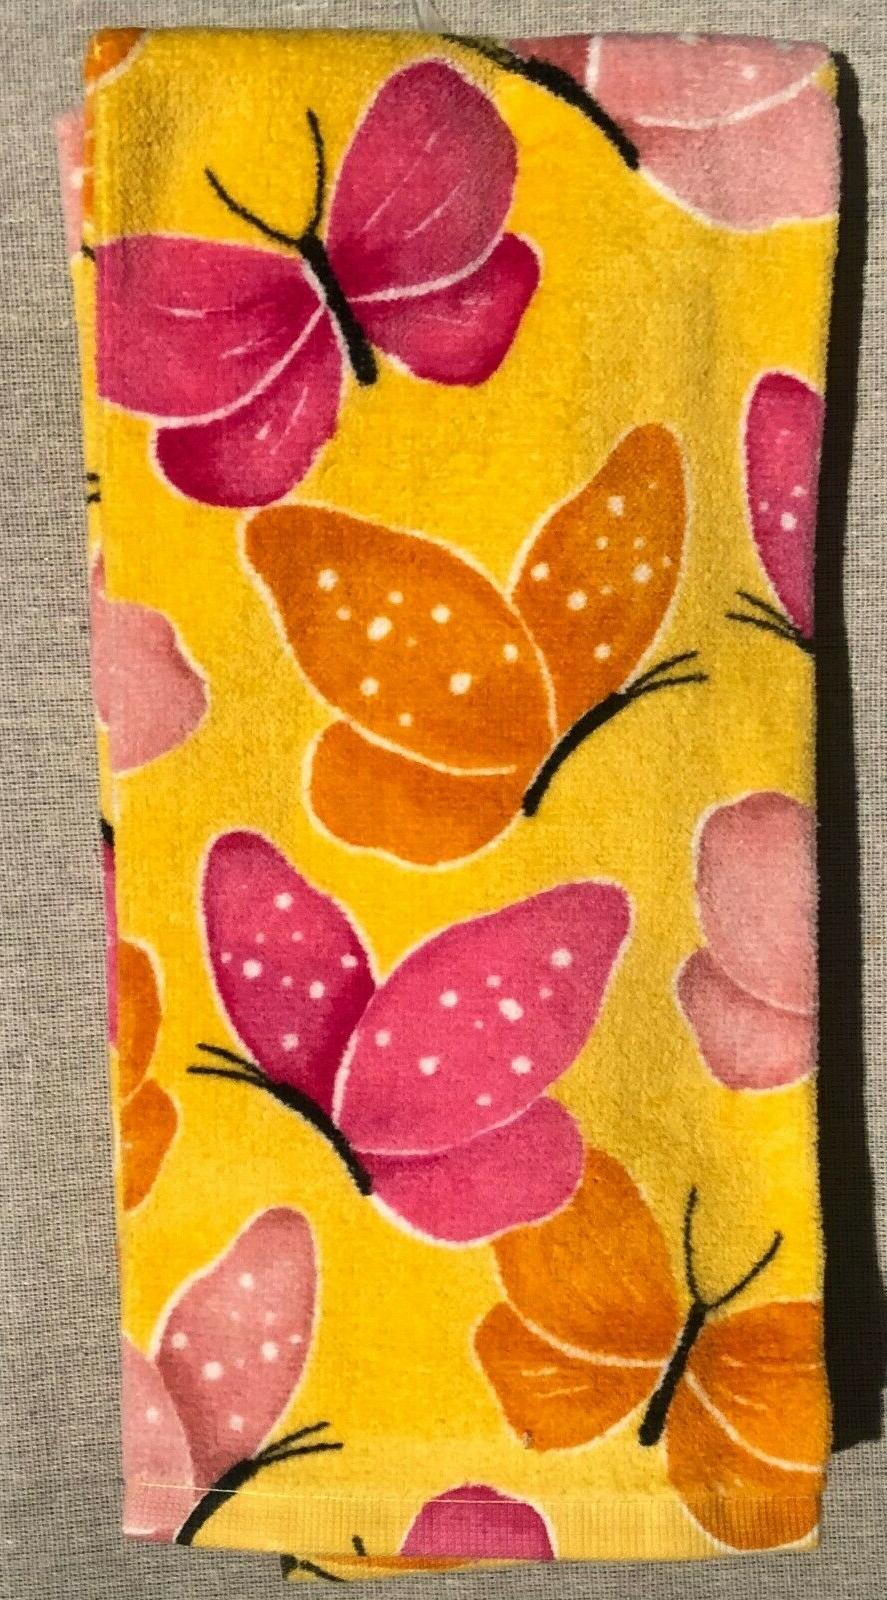 Ritz Orange Butterfly Theme Set of 2 Kitchen Towels